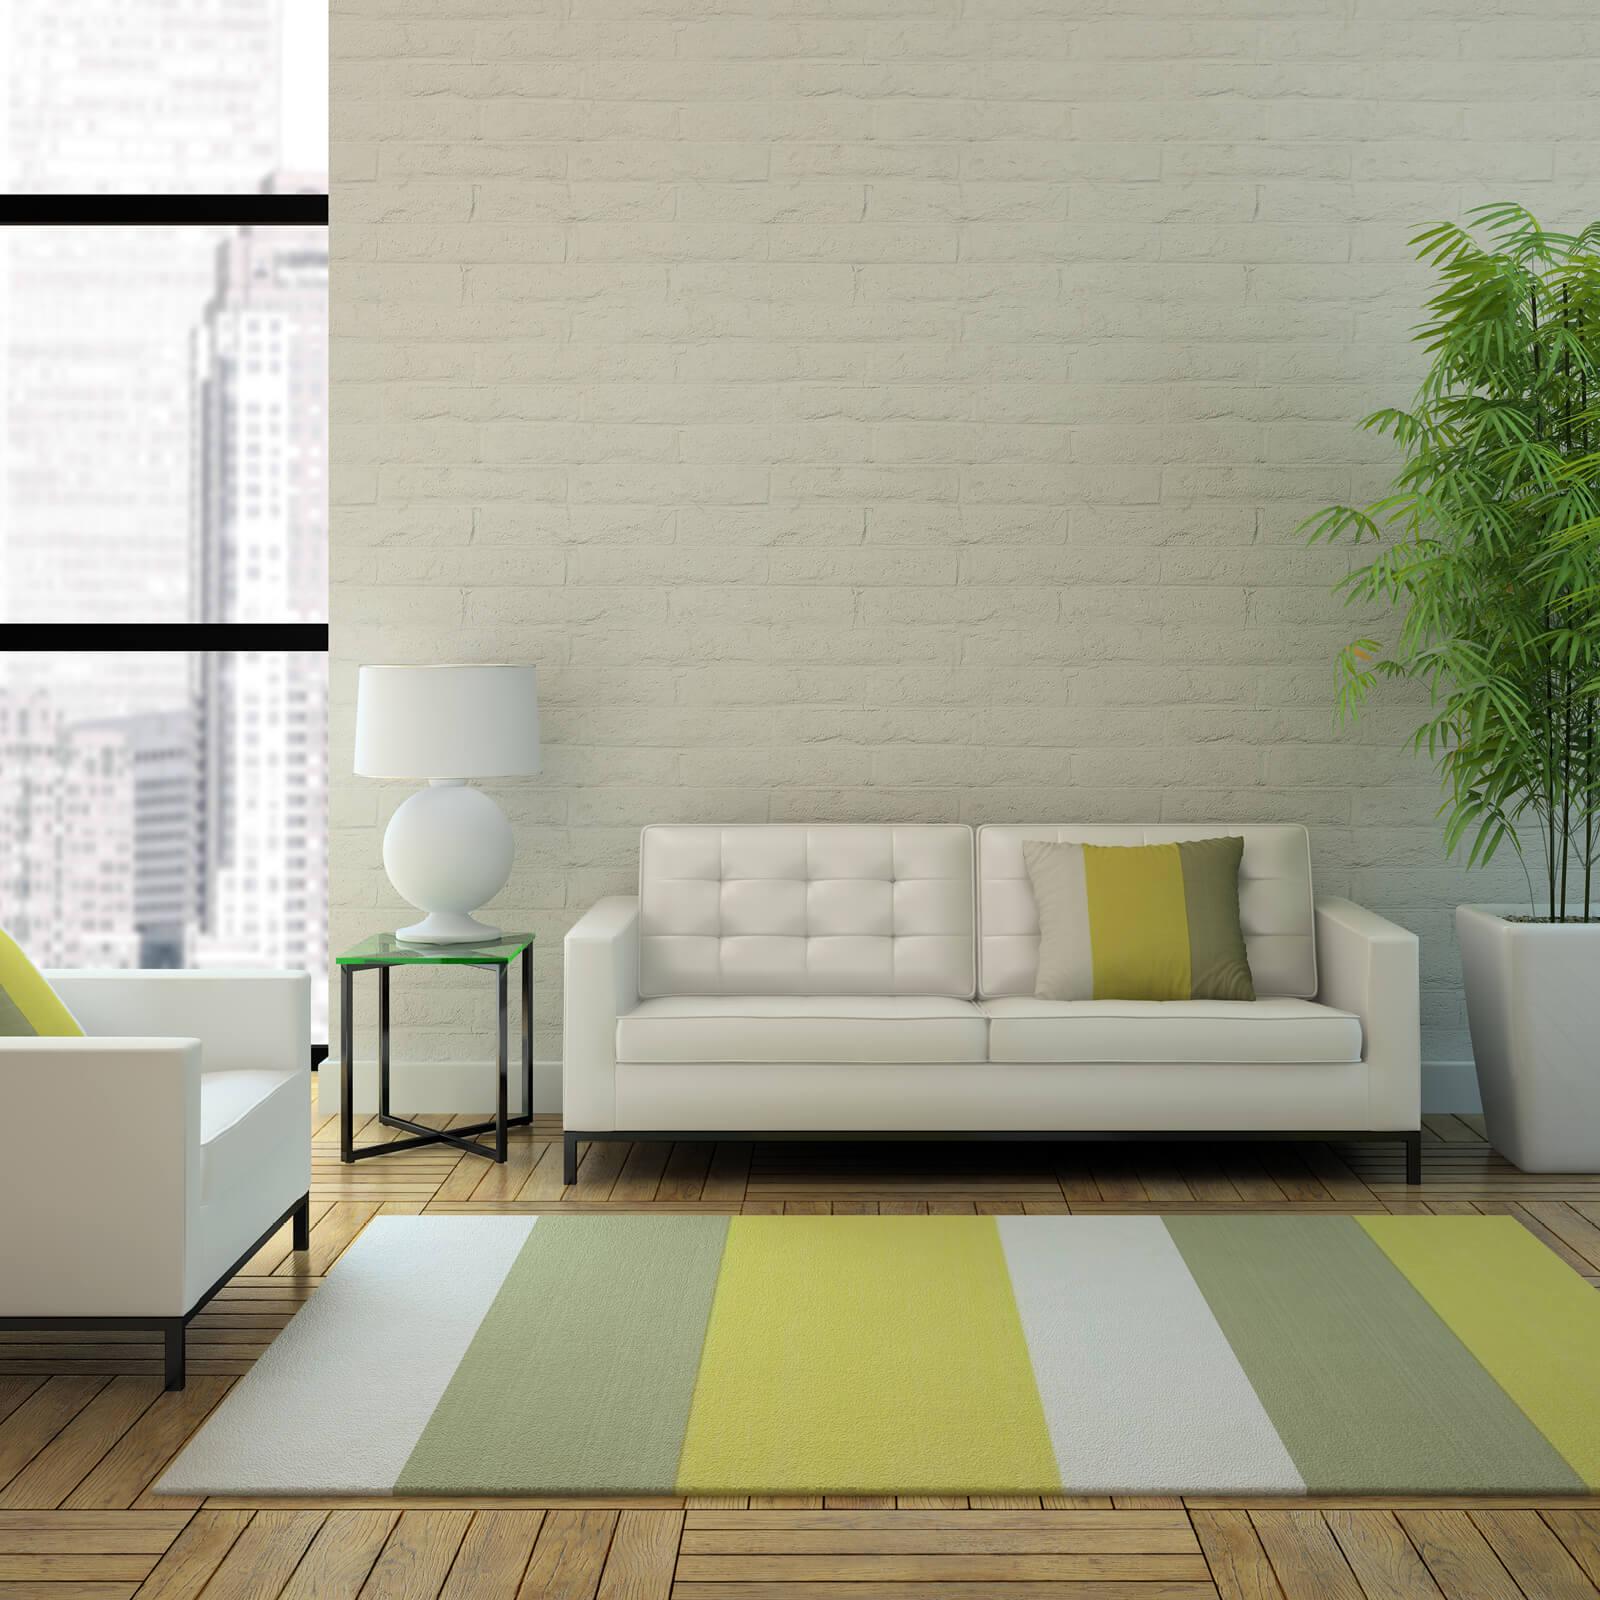 Stripped area rug | Georgia Flooring